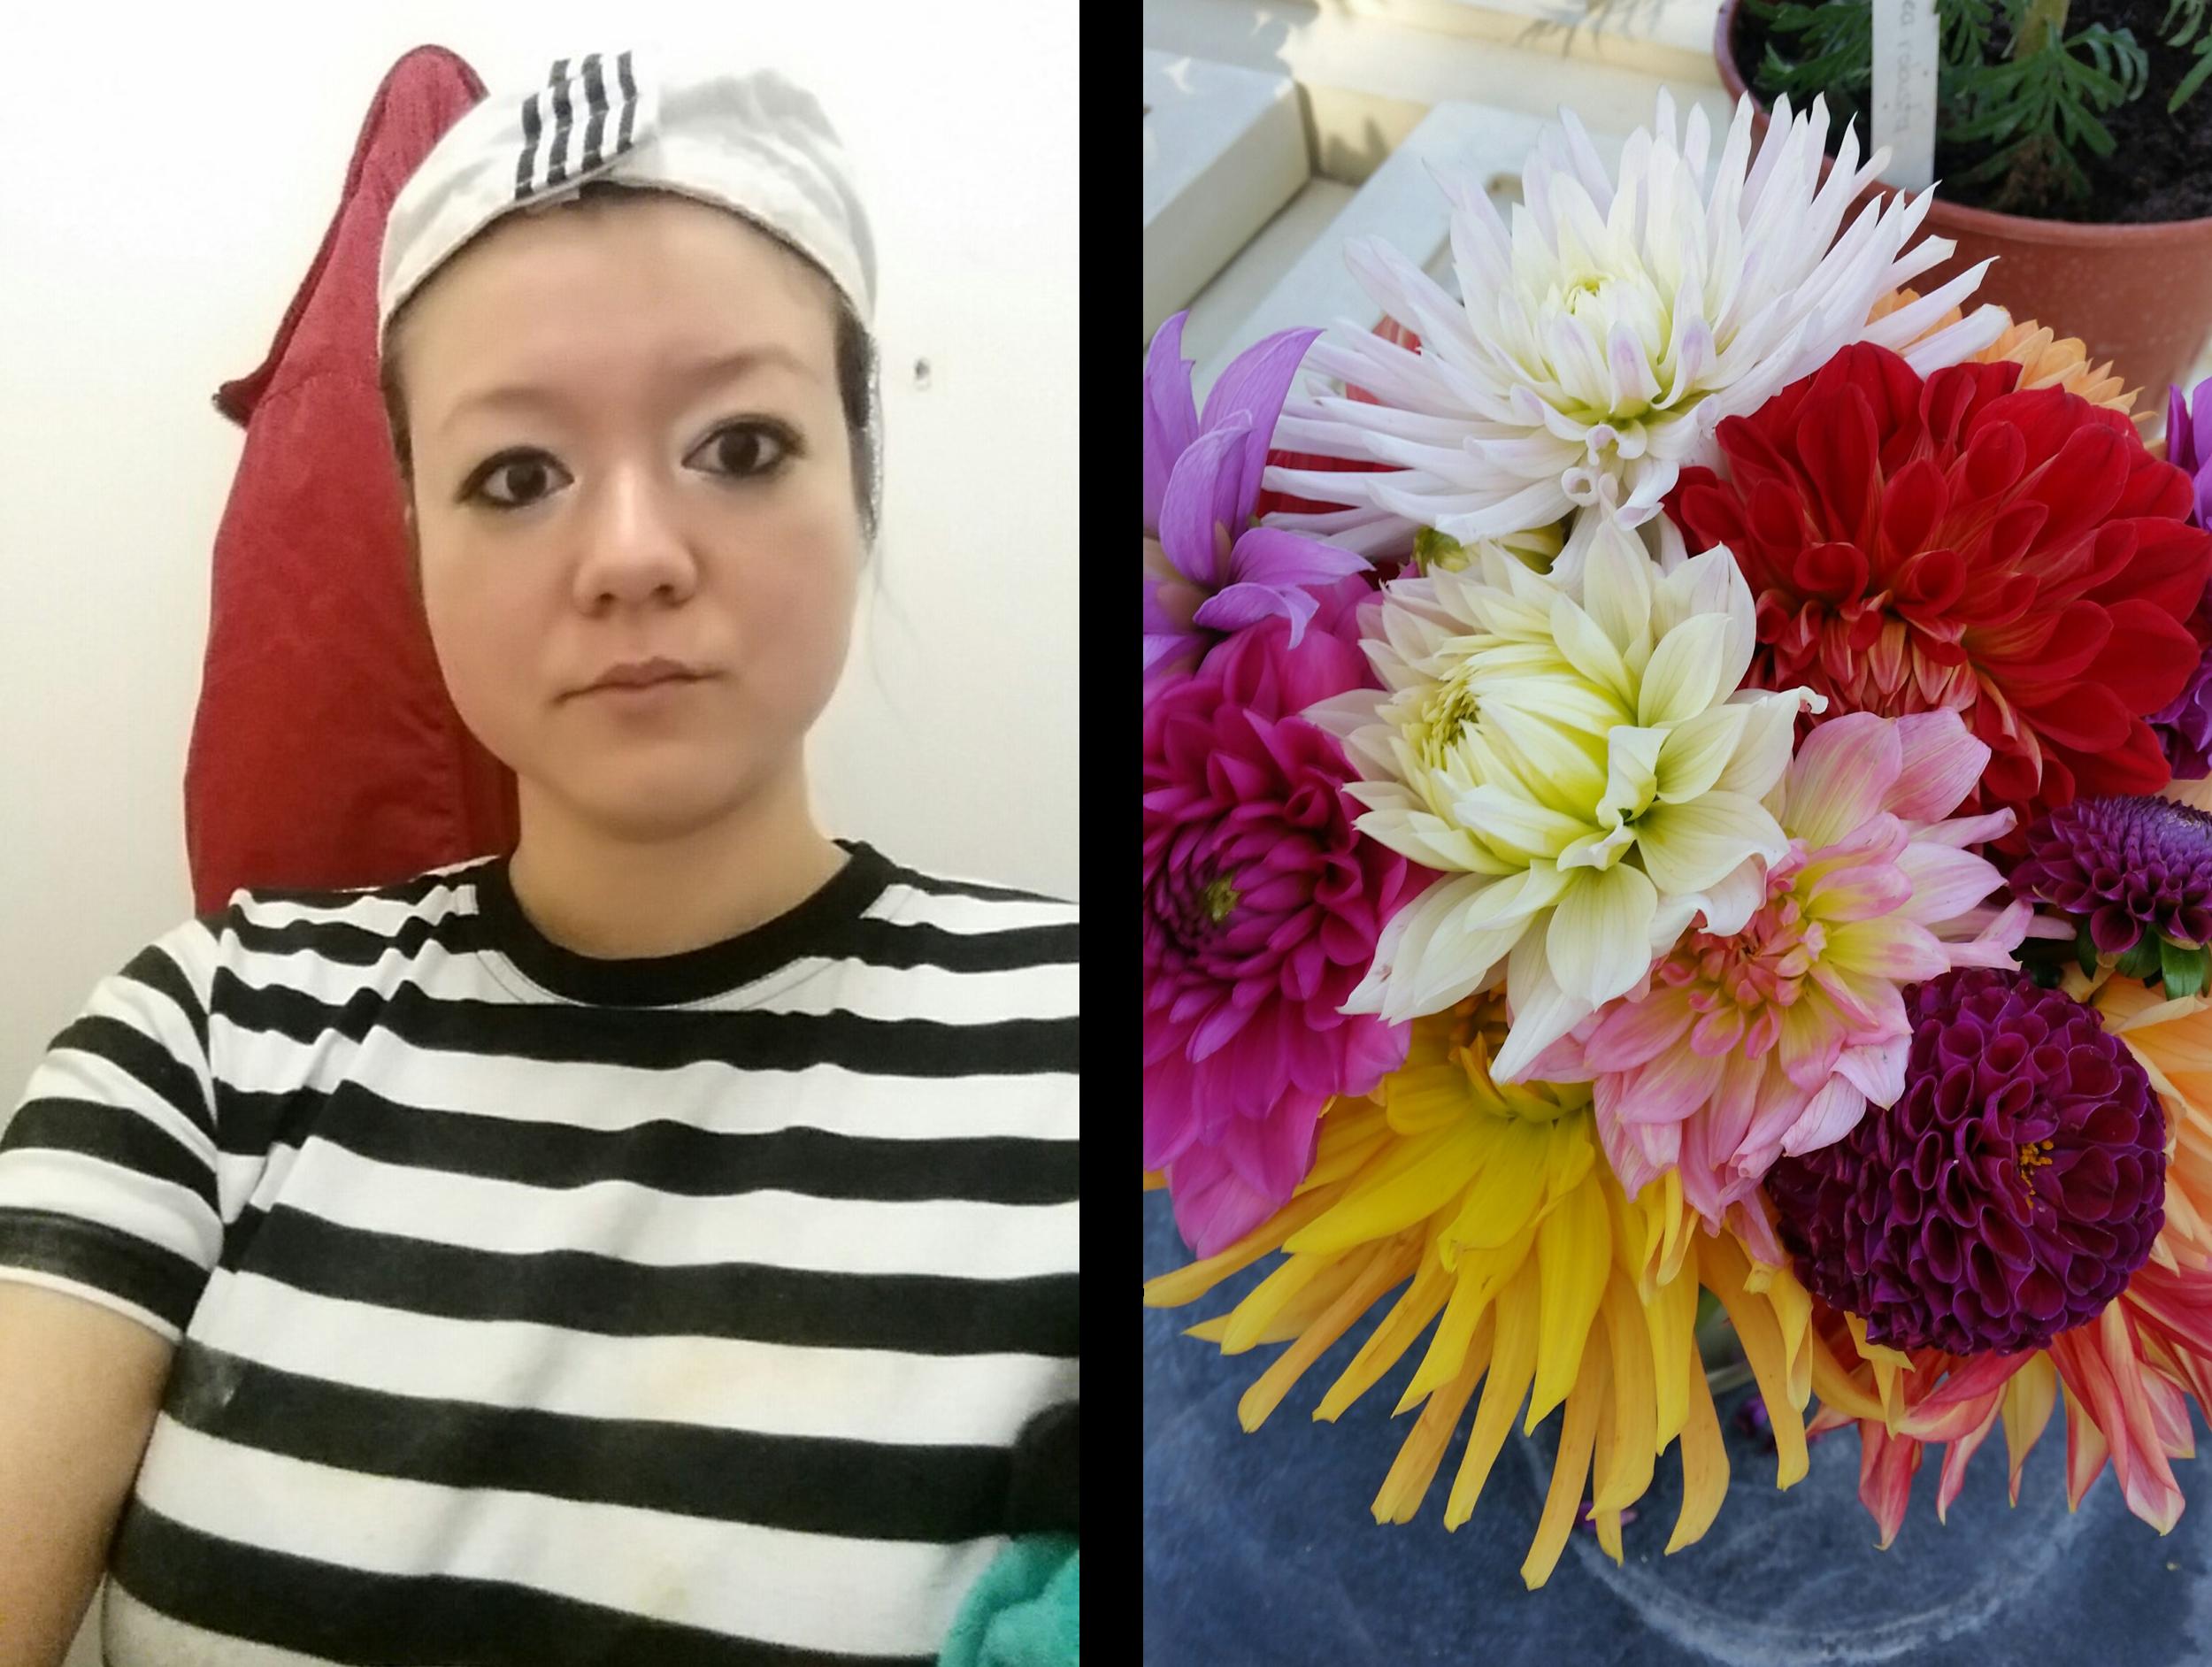 My chef outfit aka prison uniform.